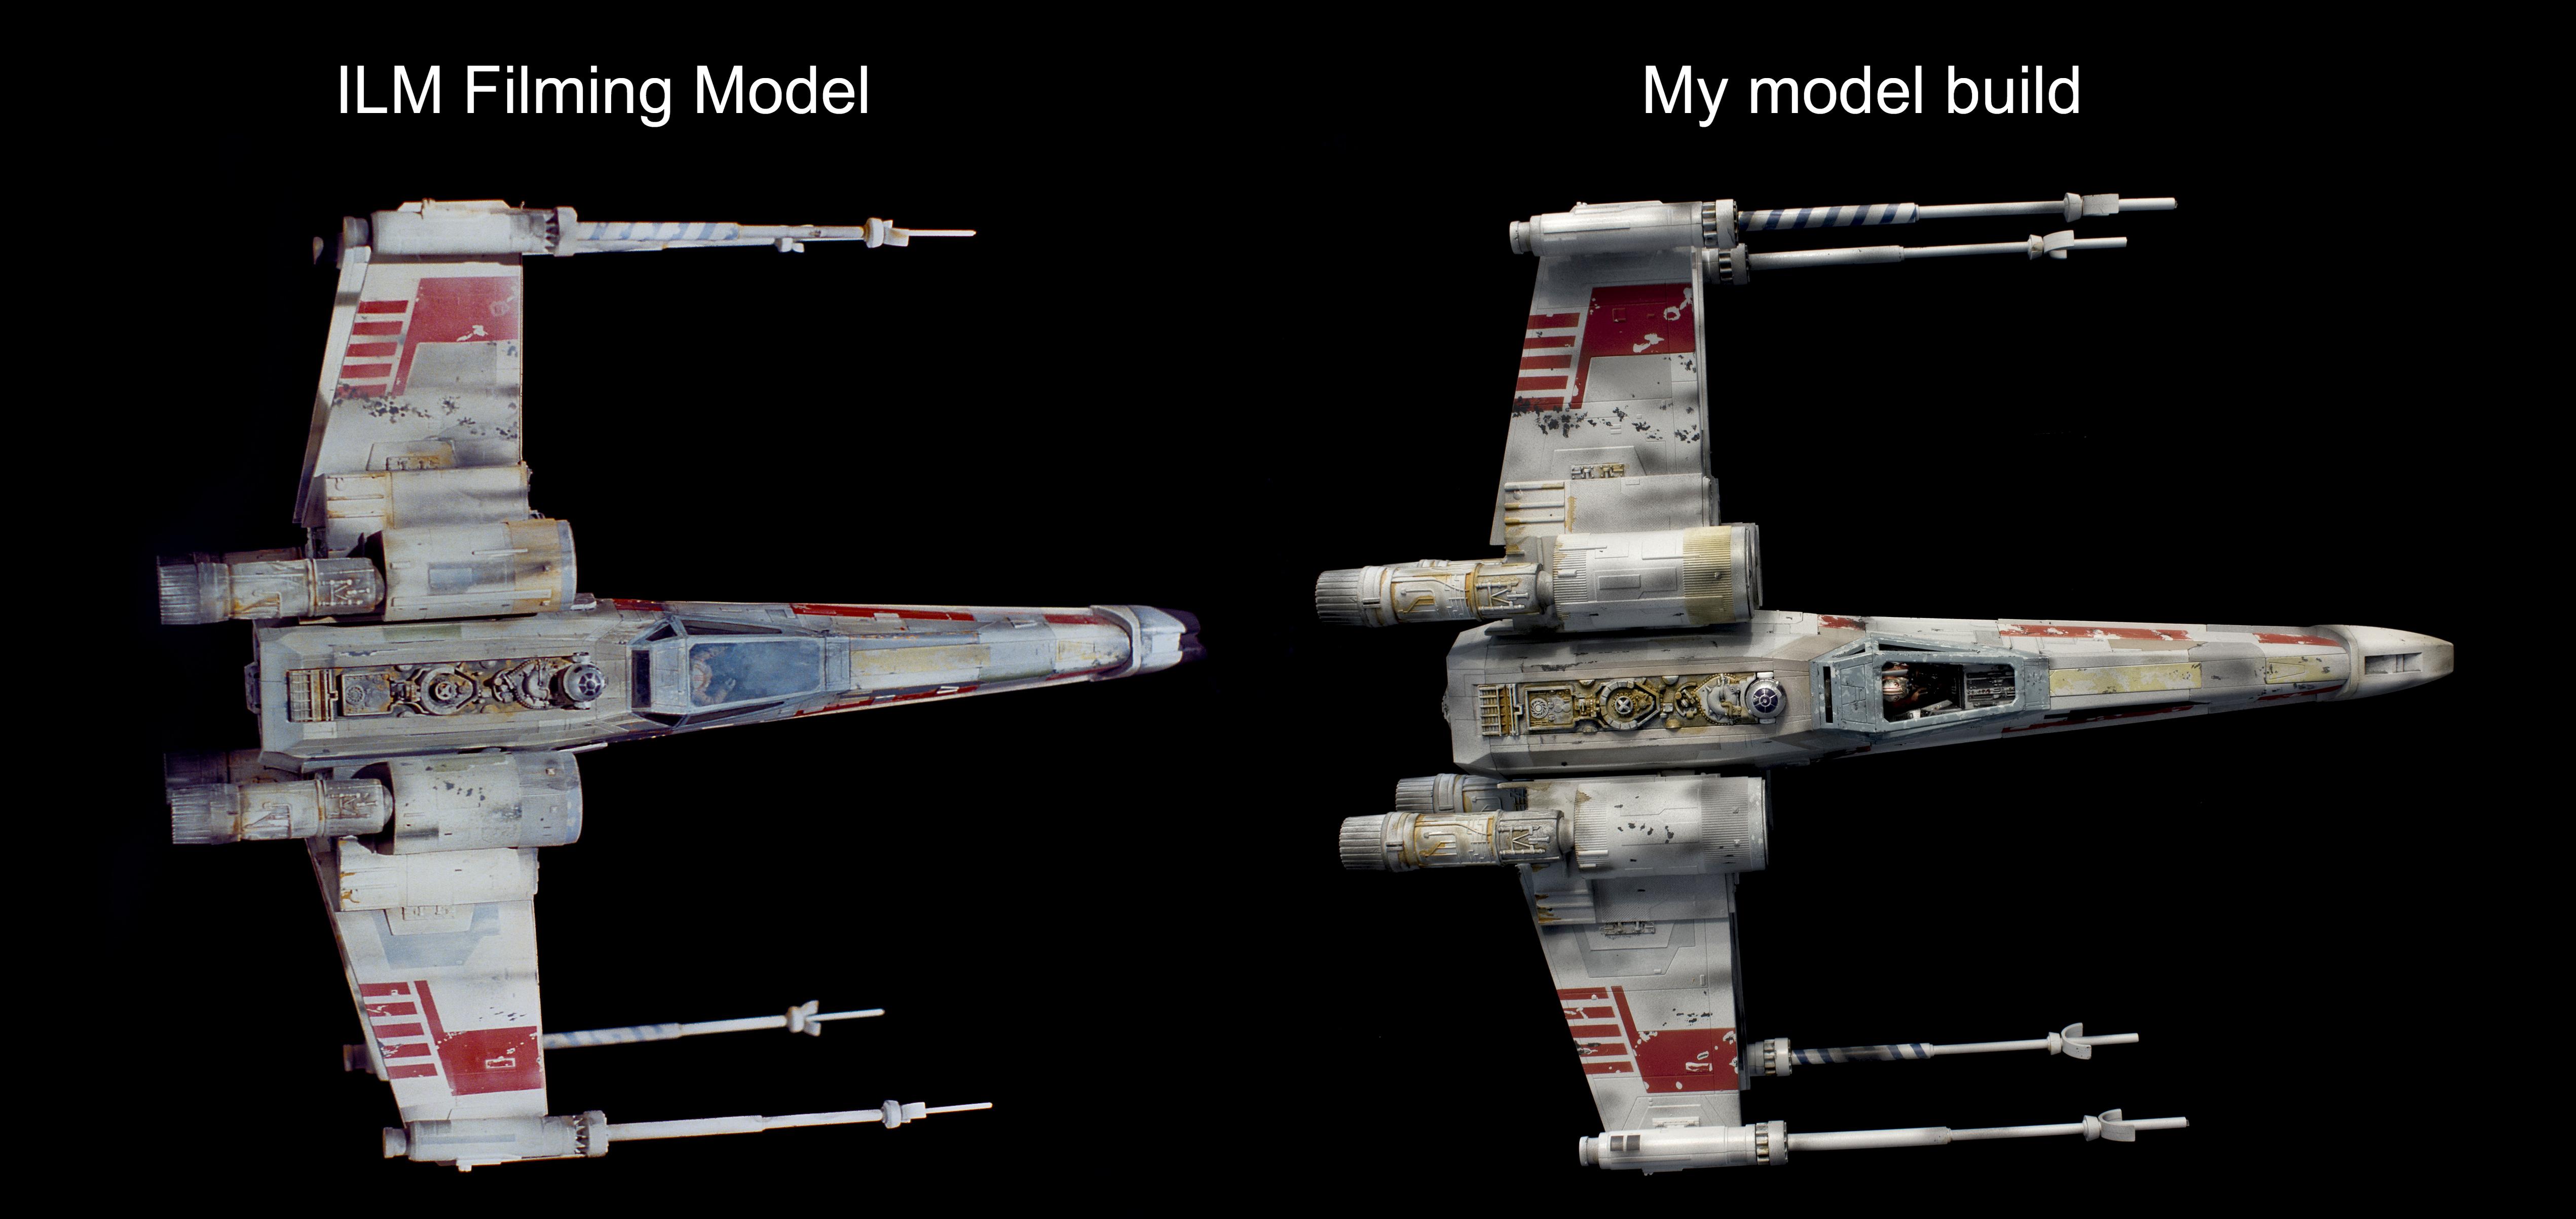 SW_X-Wing42_Comparison 2.jpg